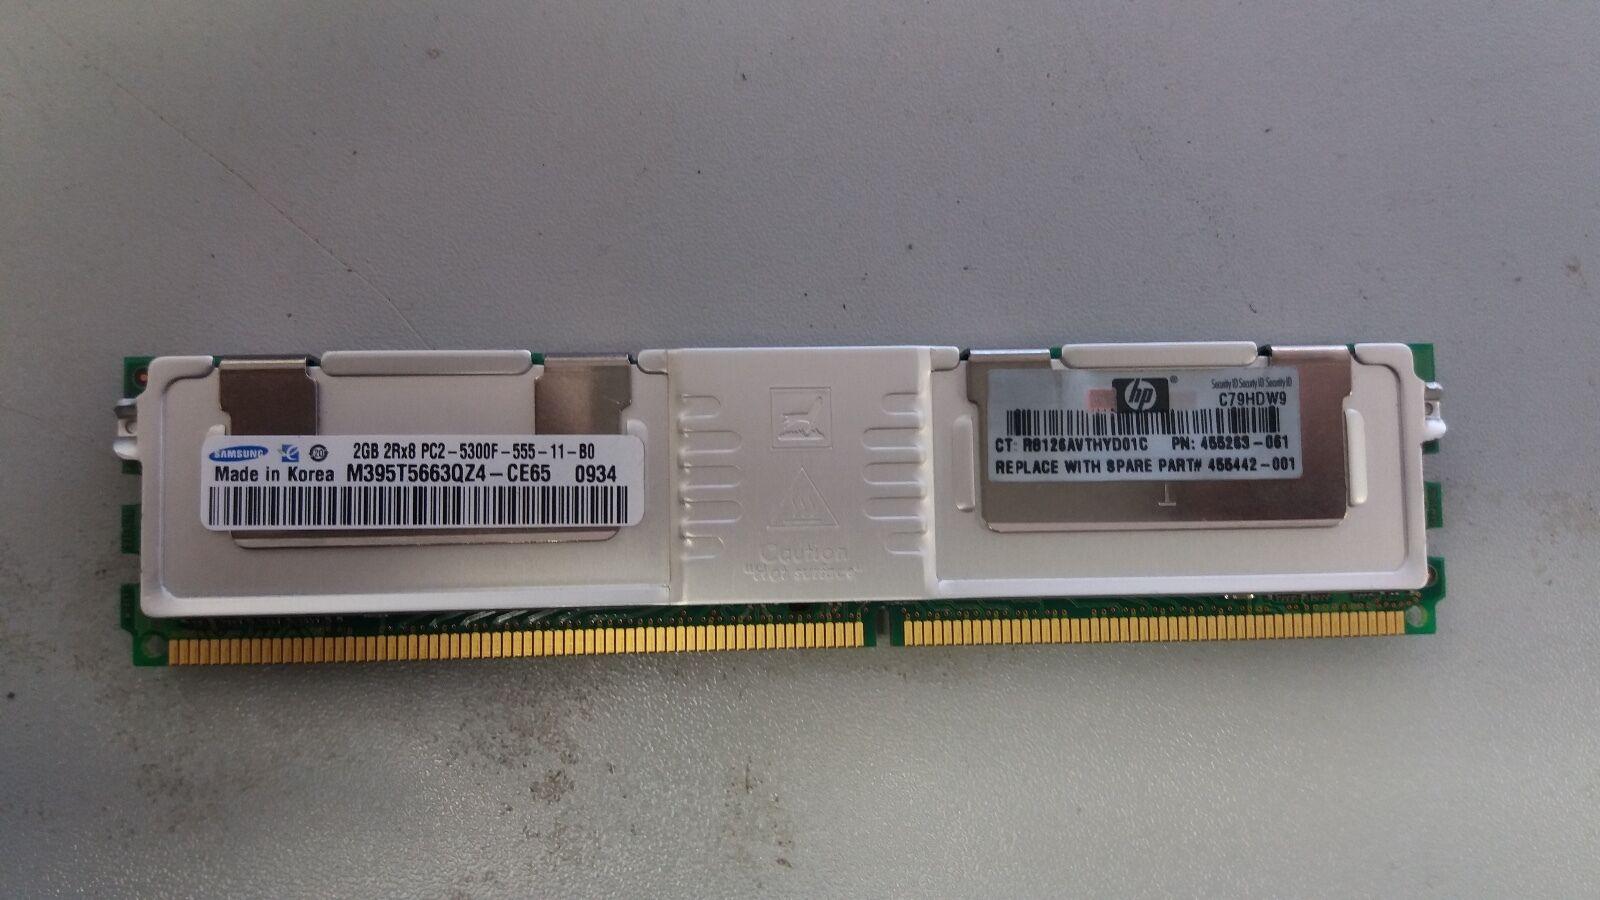 Samsung M395T5663QZ4-CE68 2GB PC2-5300F DDR2-667 2RX8 ECC Server RAM Memory